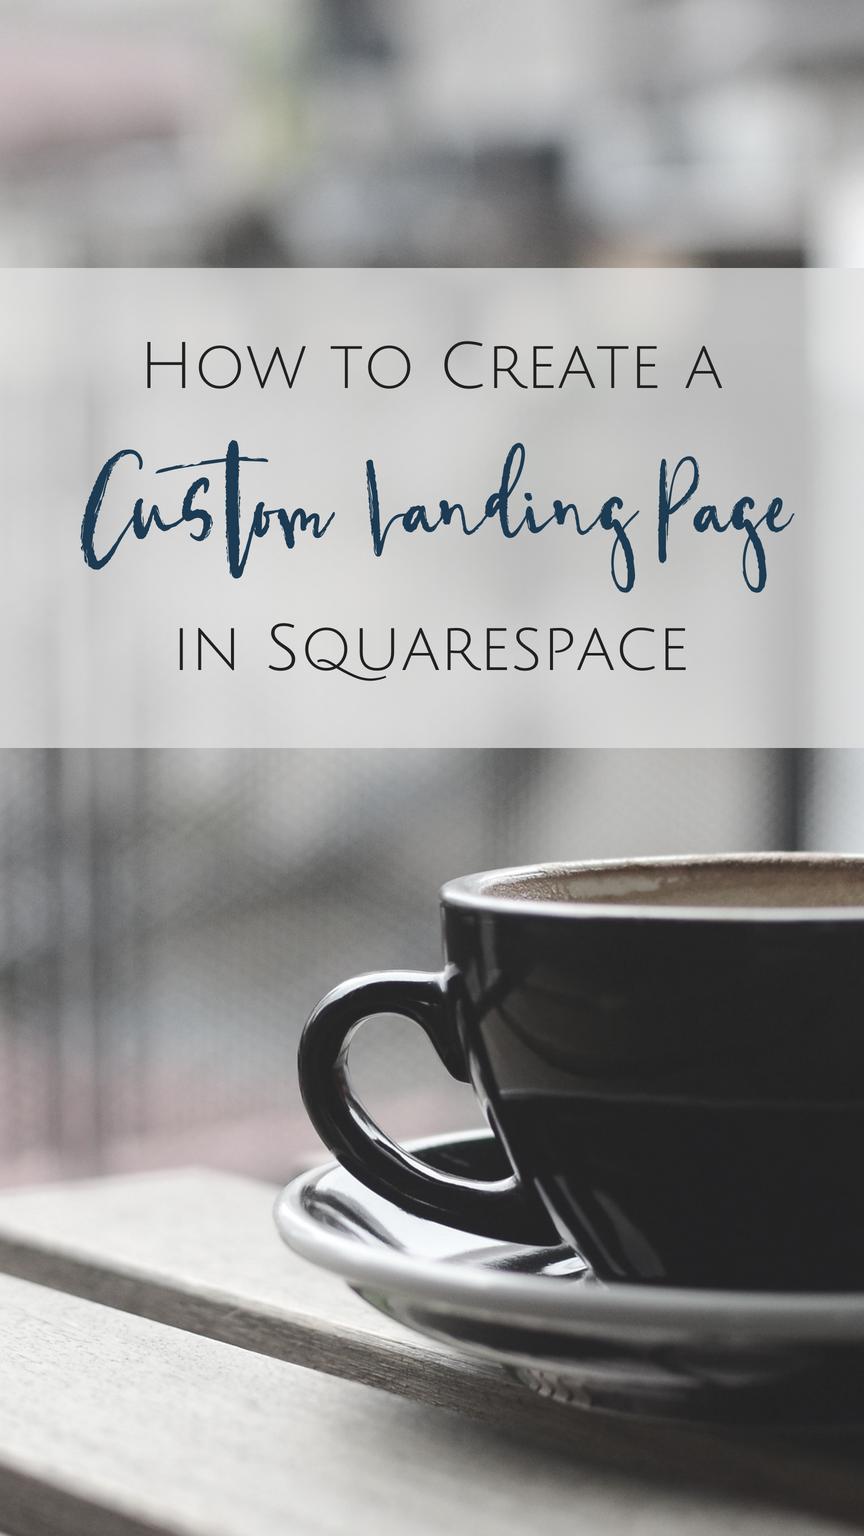 Create a Custom Landing Page